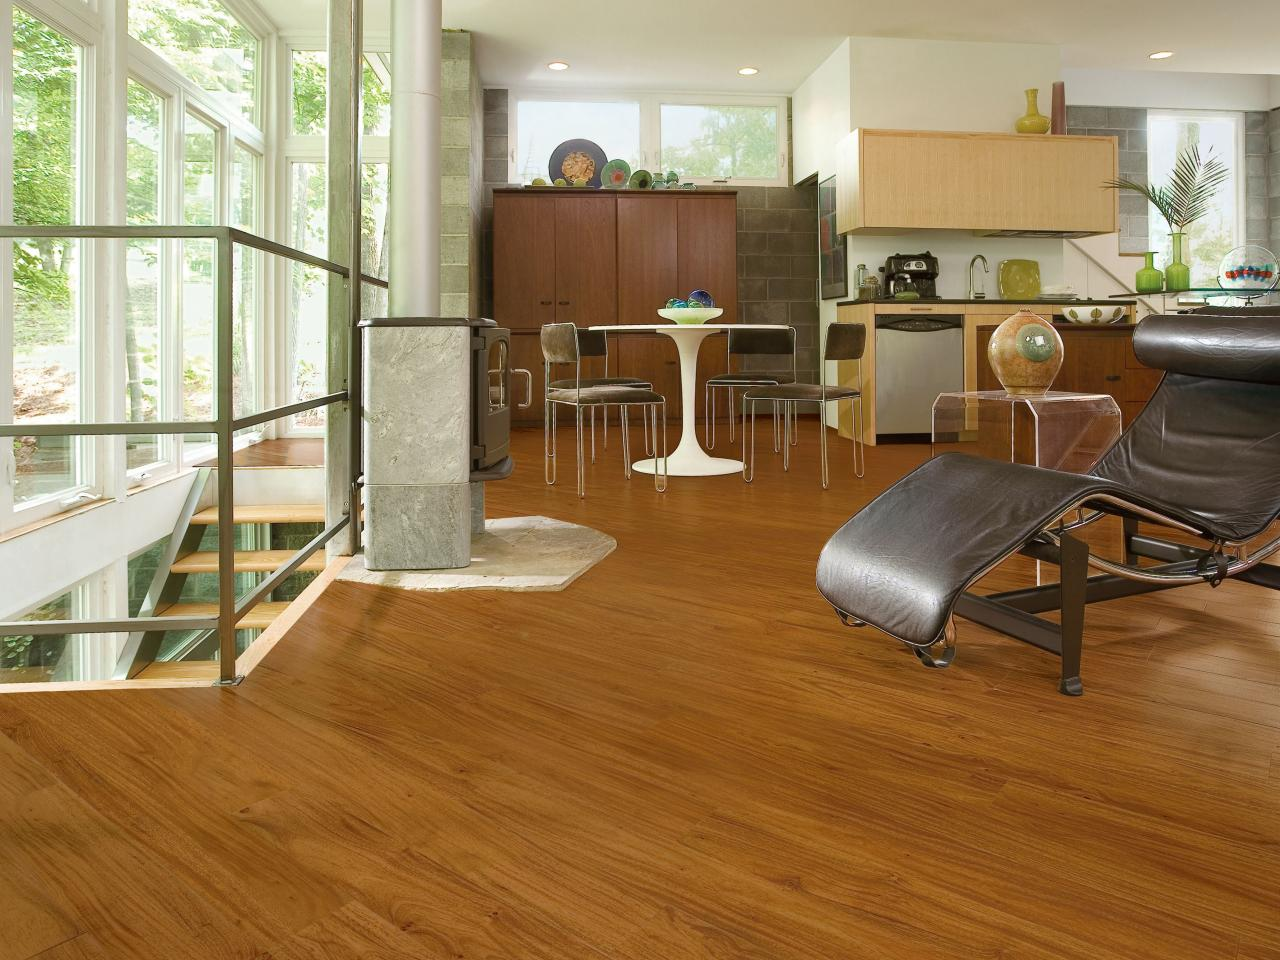 Flooring trends hgtv vinyl in demand modern open kitchen with faux wood flooring dailygadgetfo Gallery